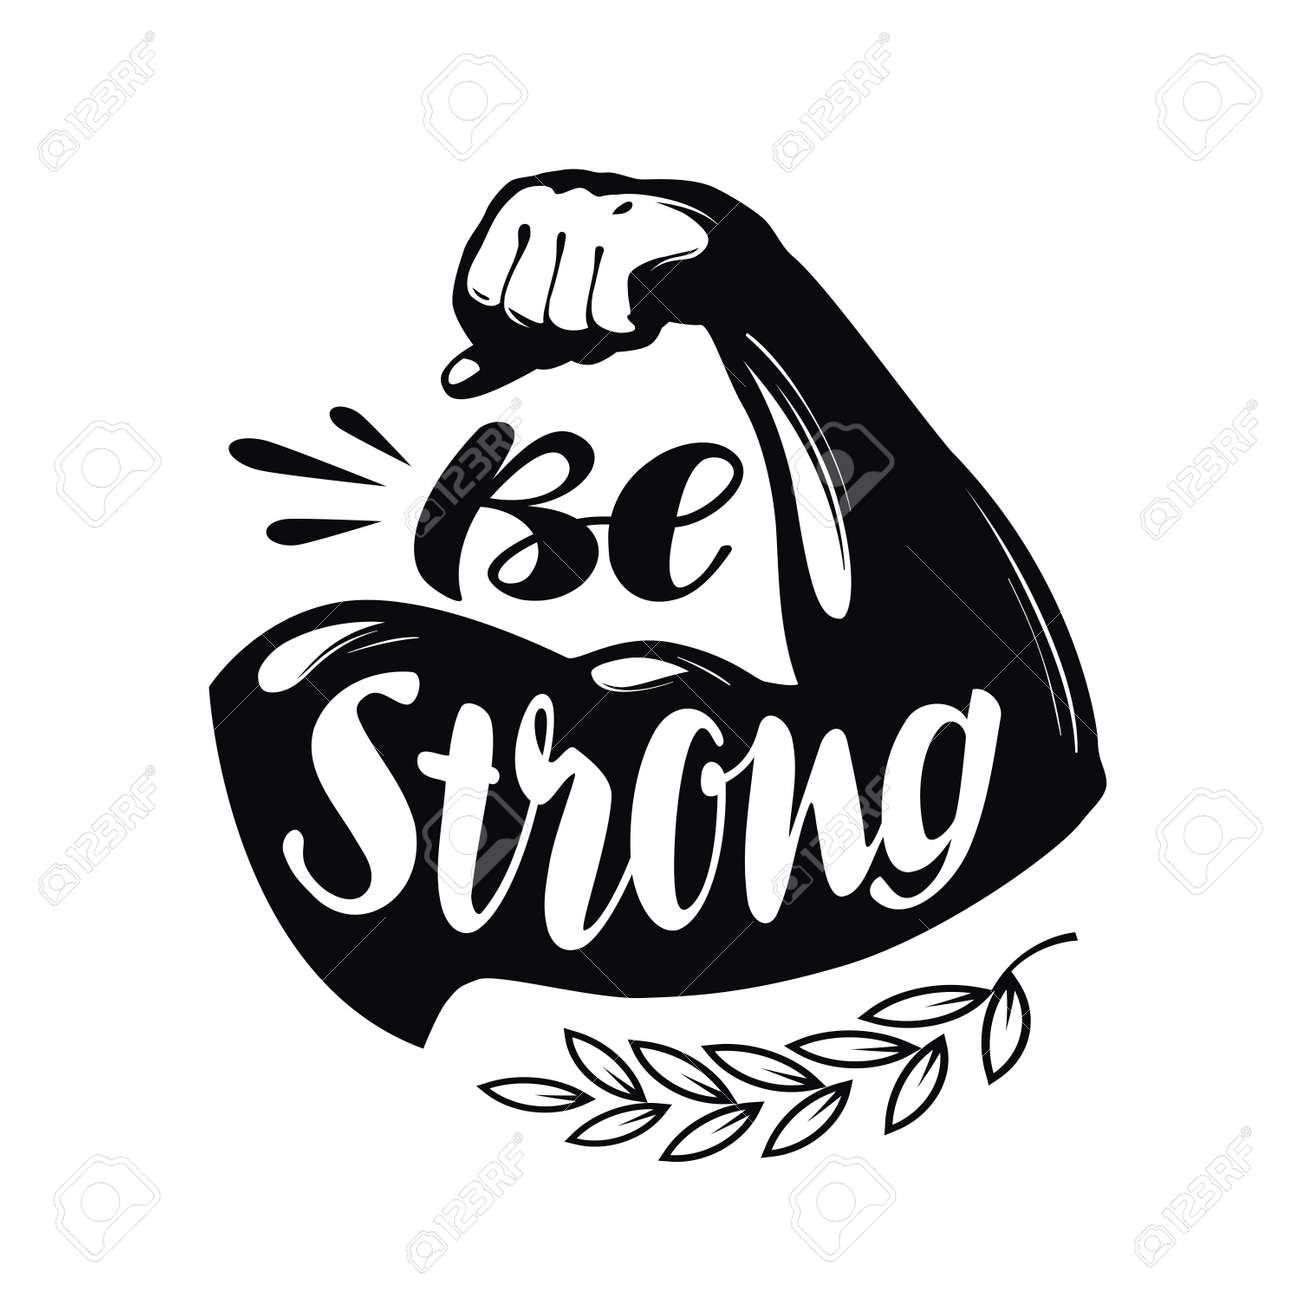 Be Strong, lettering. Sport gym, fitness label. Vector illustration - 71763931